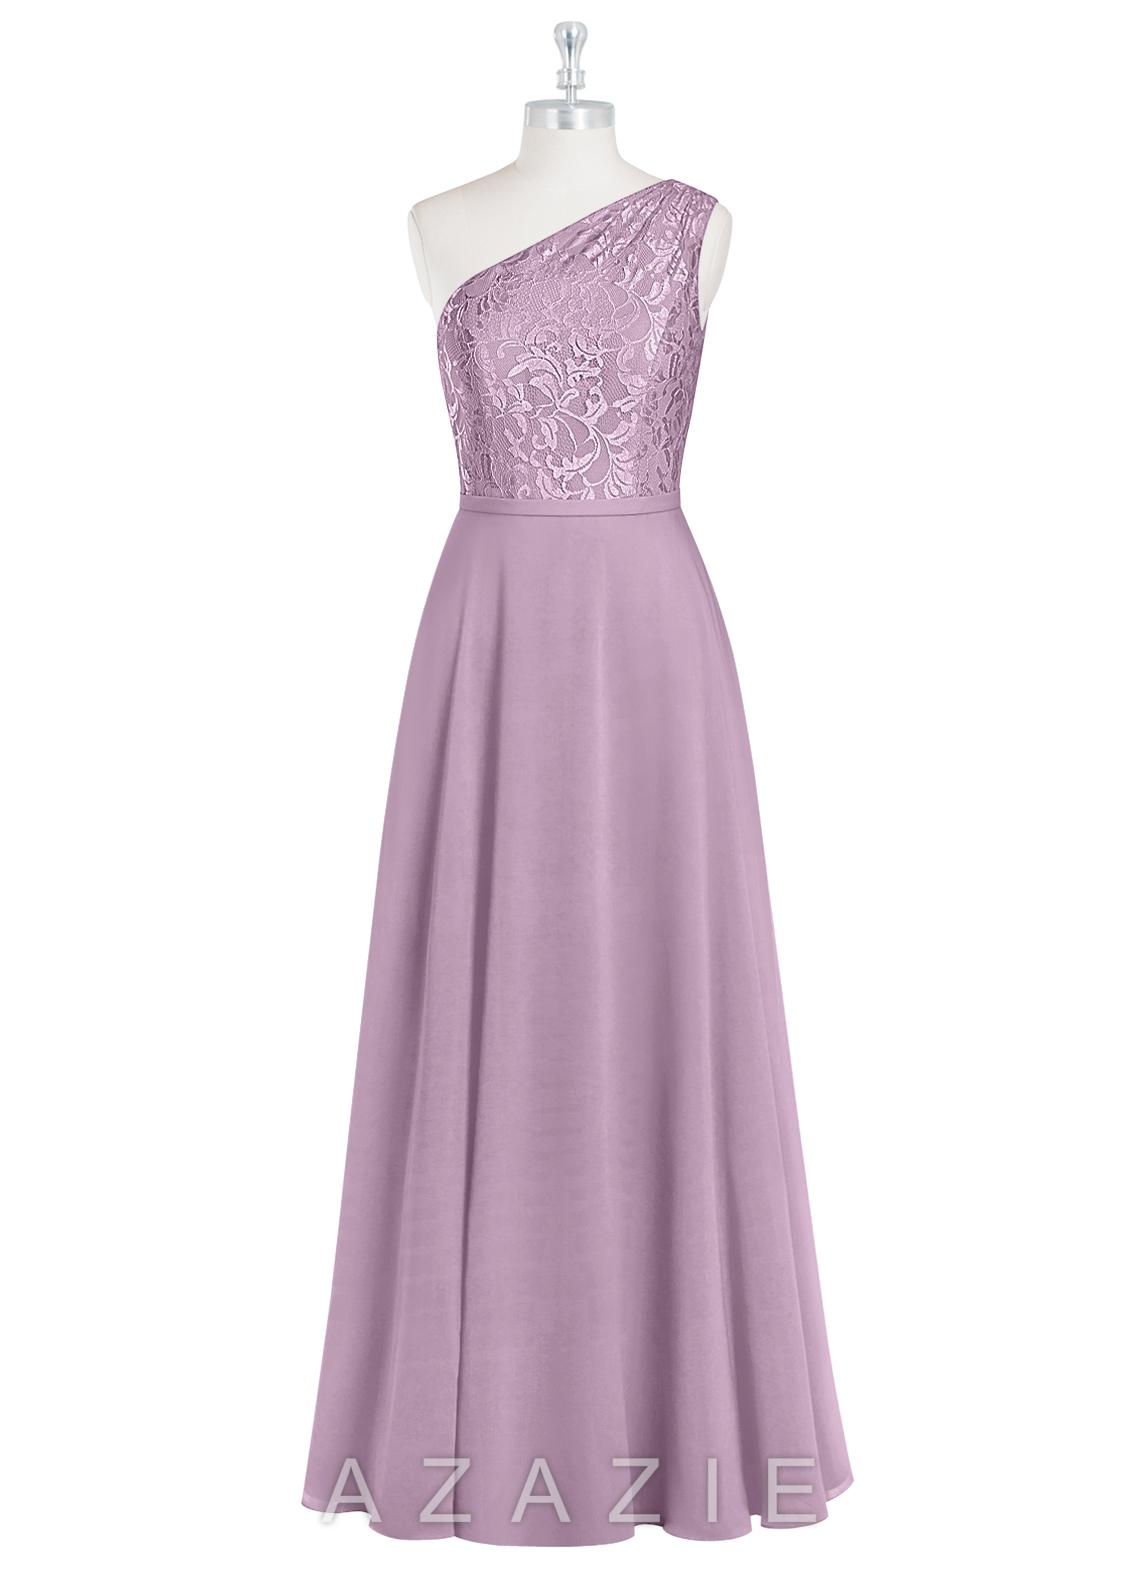 2ad15000c759 Azazie Simone Bridesmaid Dress